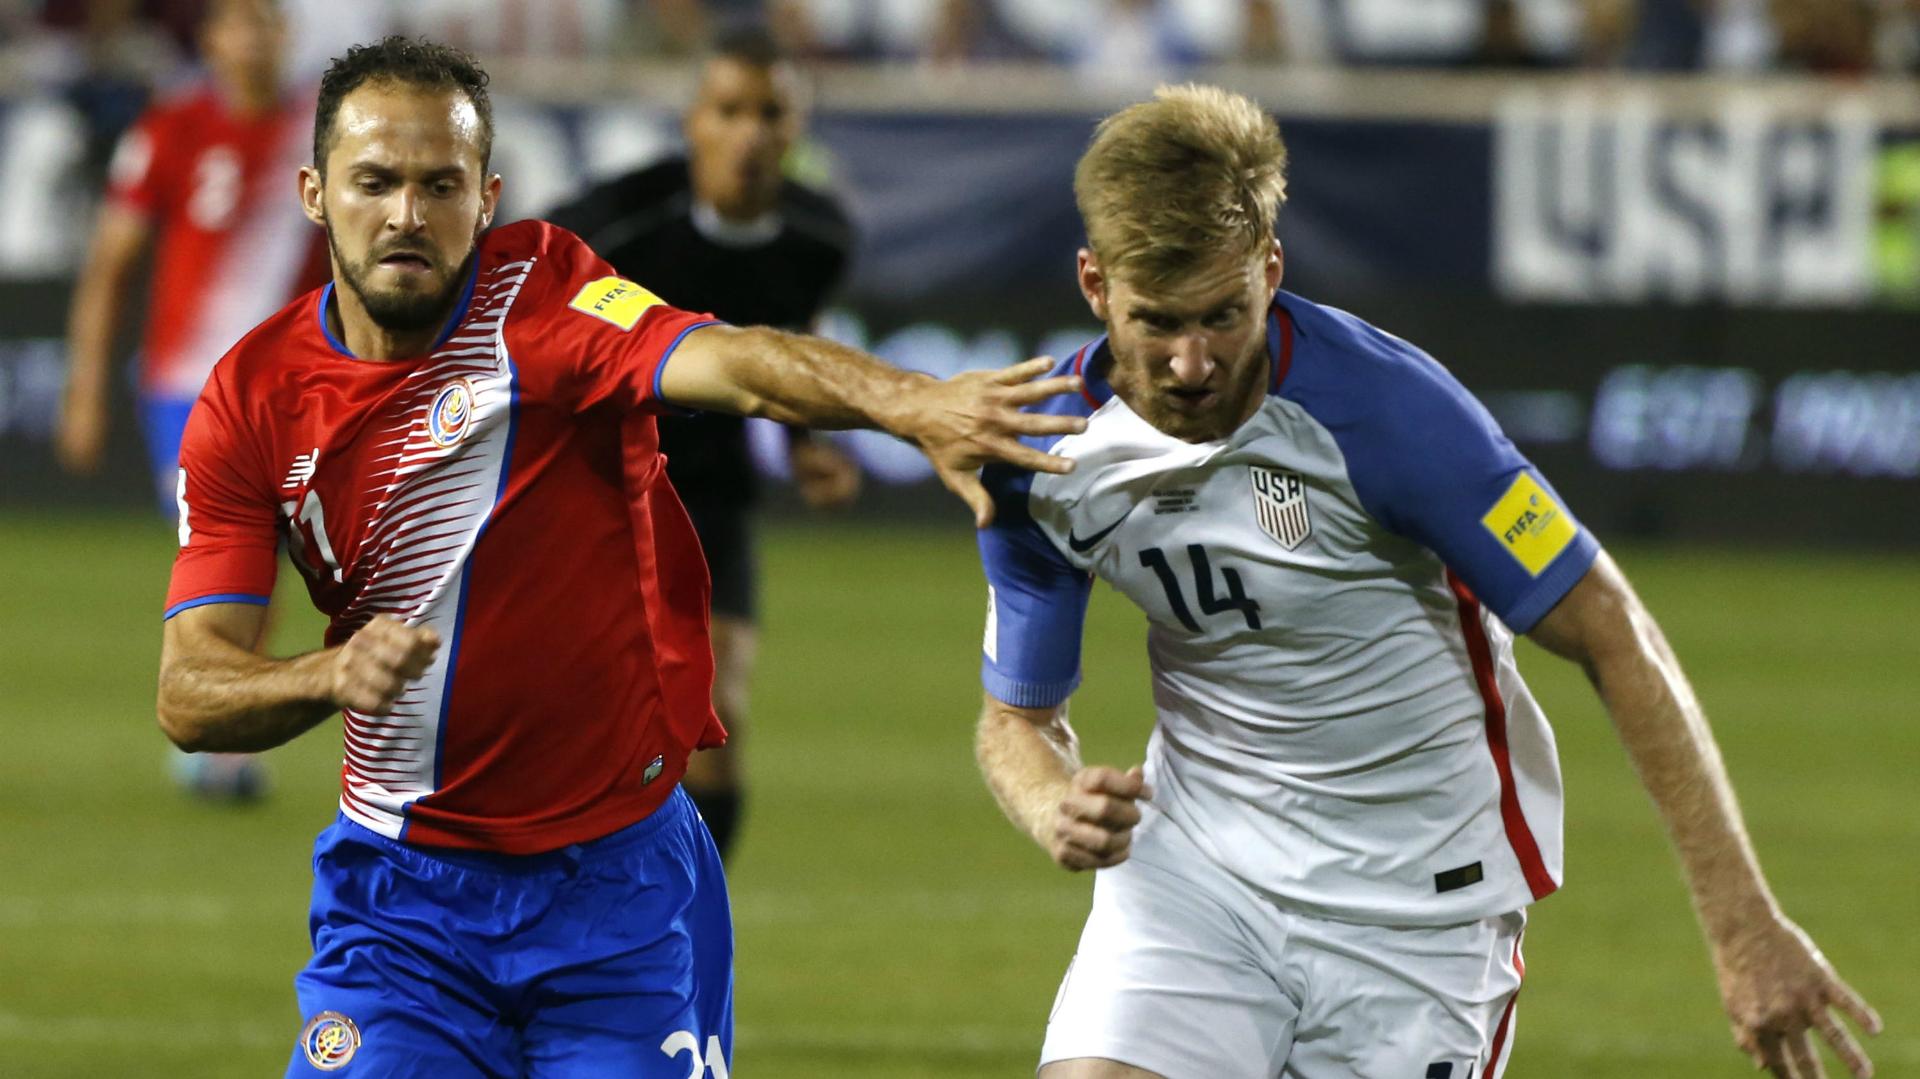 Marco Urena Tim Ream Costa Rica USA